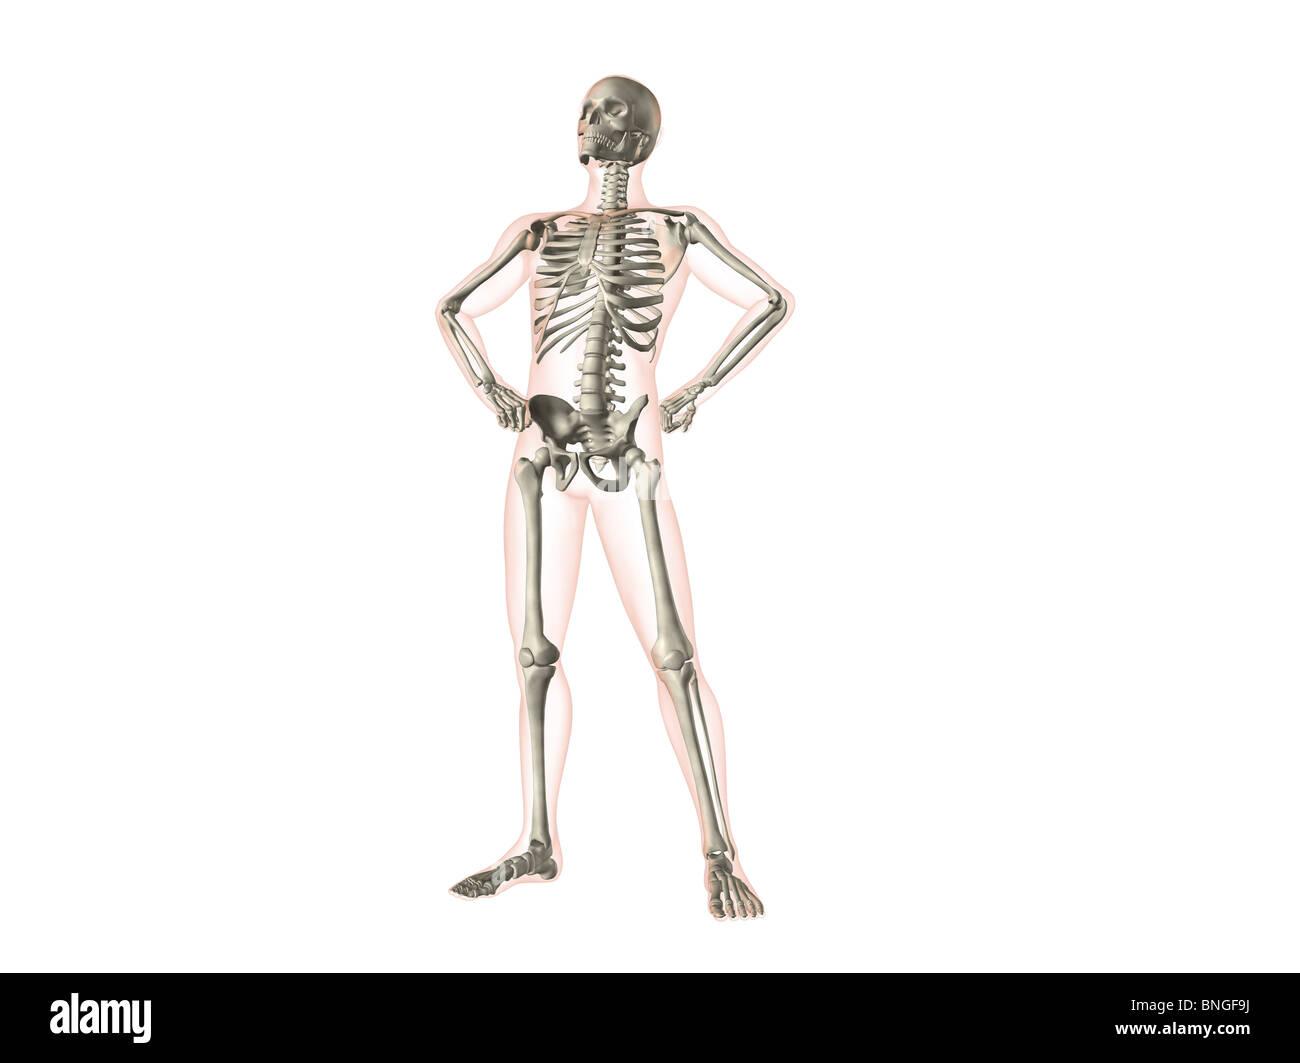 X Ray View Of A Human Skeleton Posing Stock Photo 30481406 Alamy